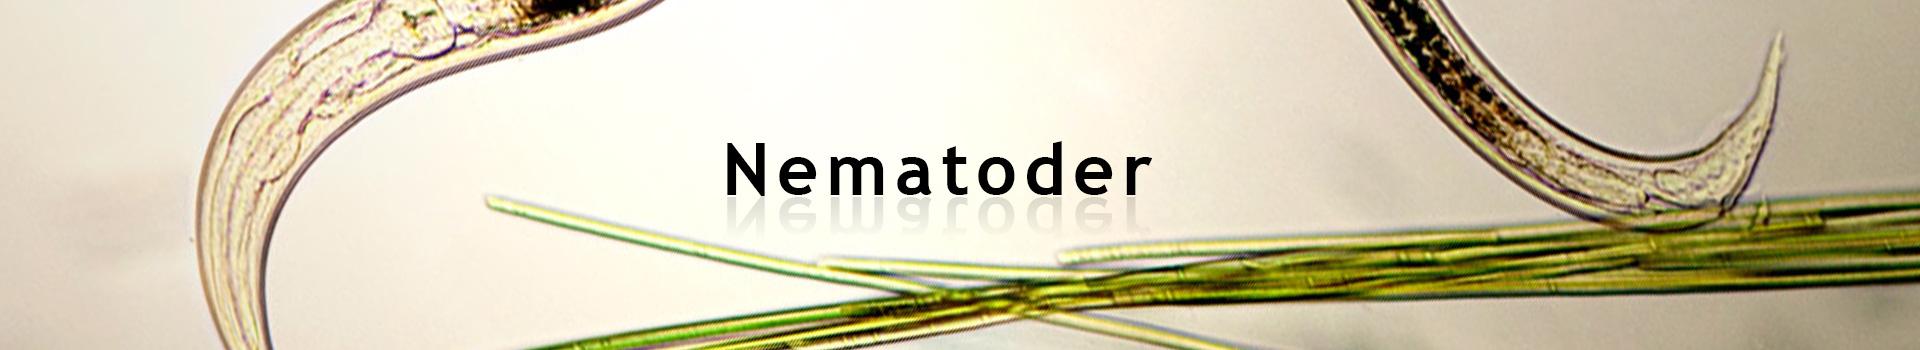 Kategoribillede_Nematoder_SE